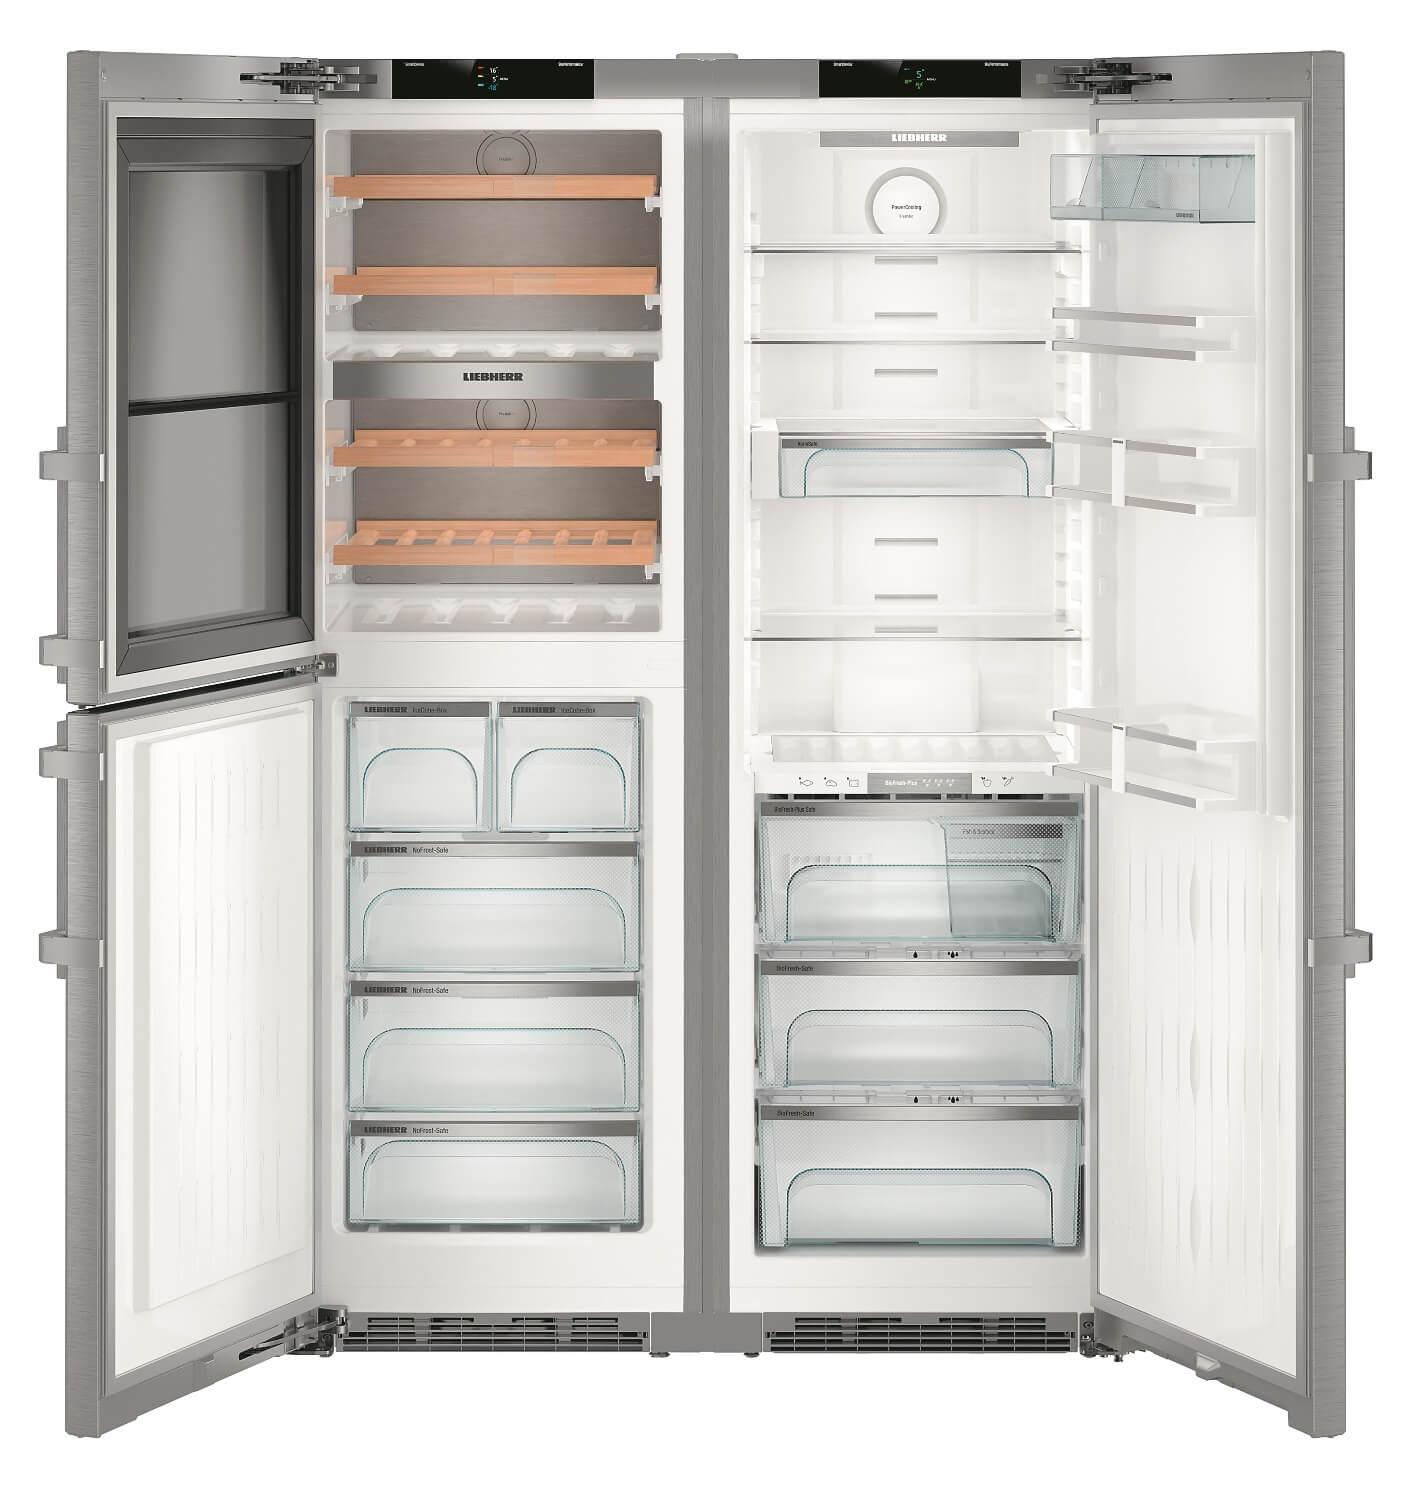 купить Side-by-Side холодильник Liebherr SBSes 8486 Украина фото 4